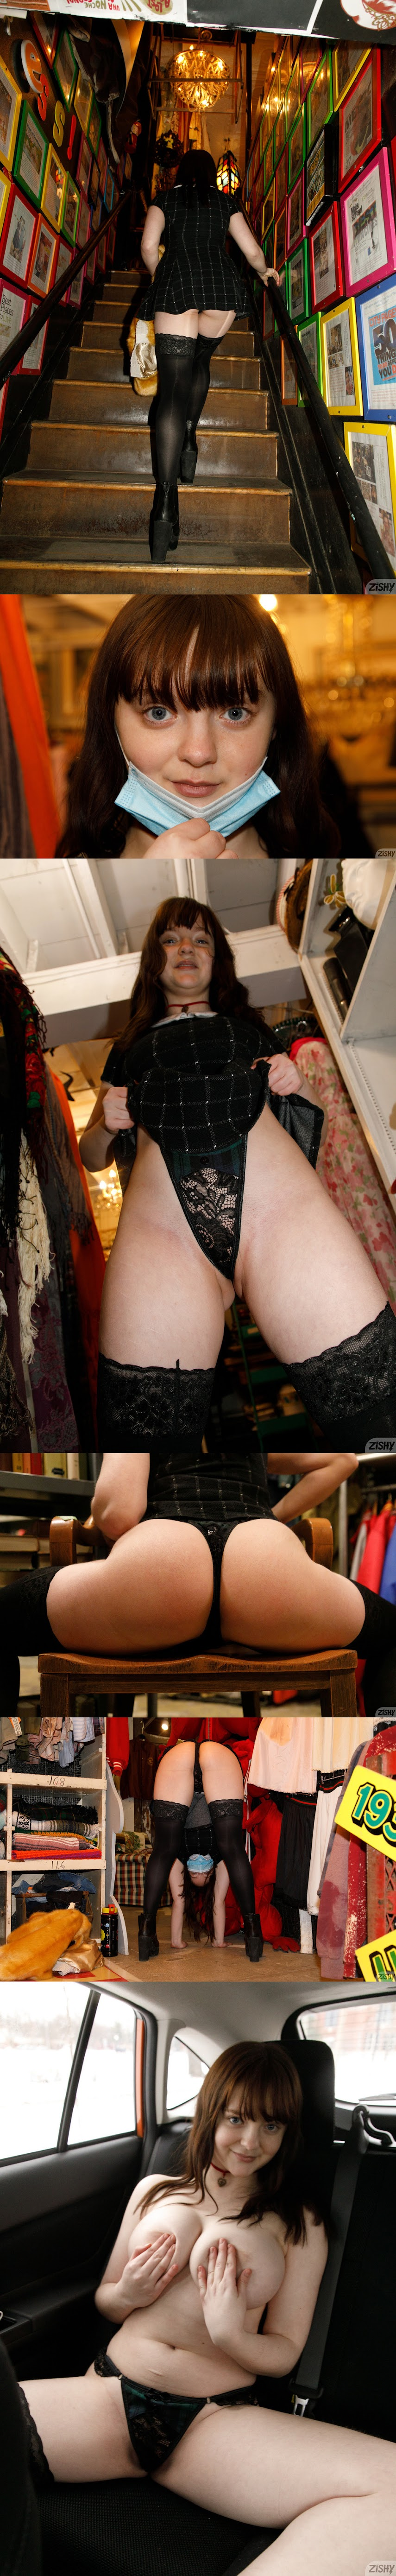 [Zishy] Daisy Wensday Hunt & Gather sexy girls image jav